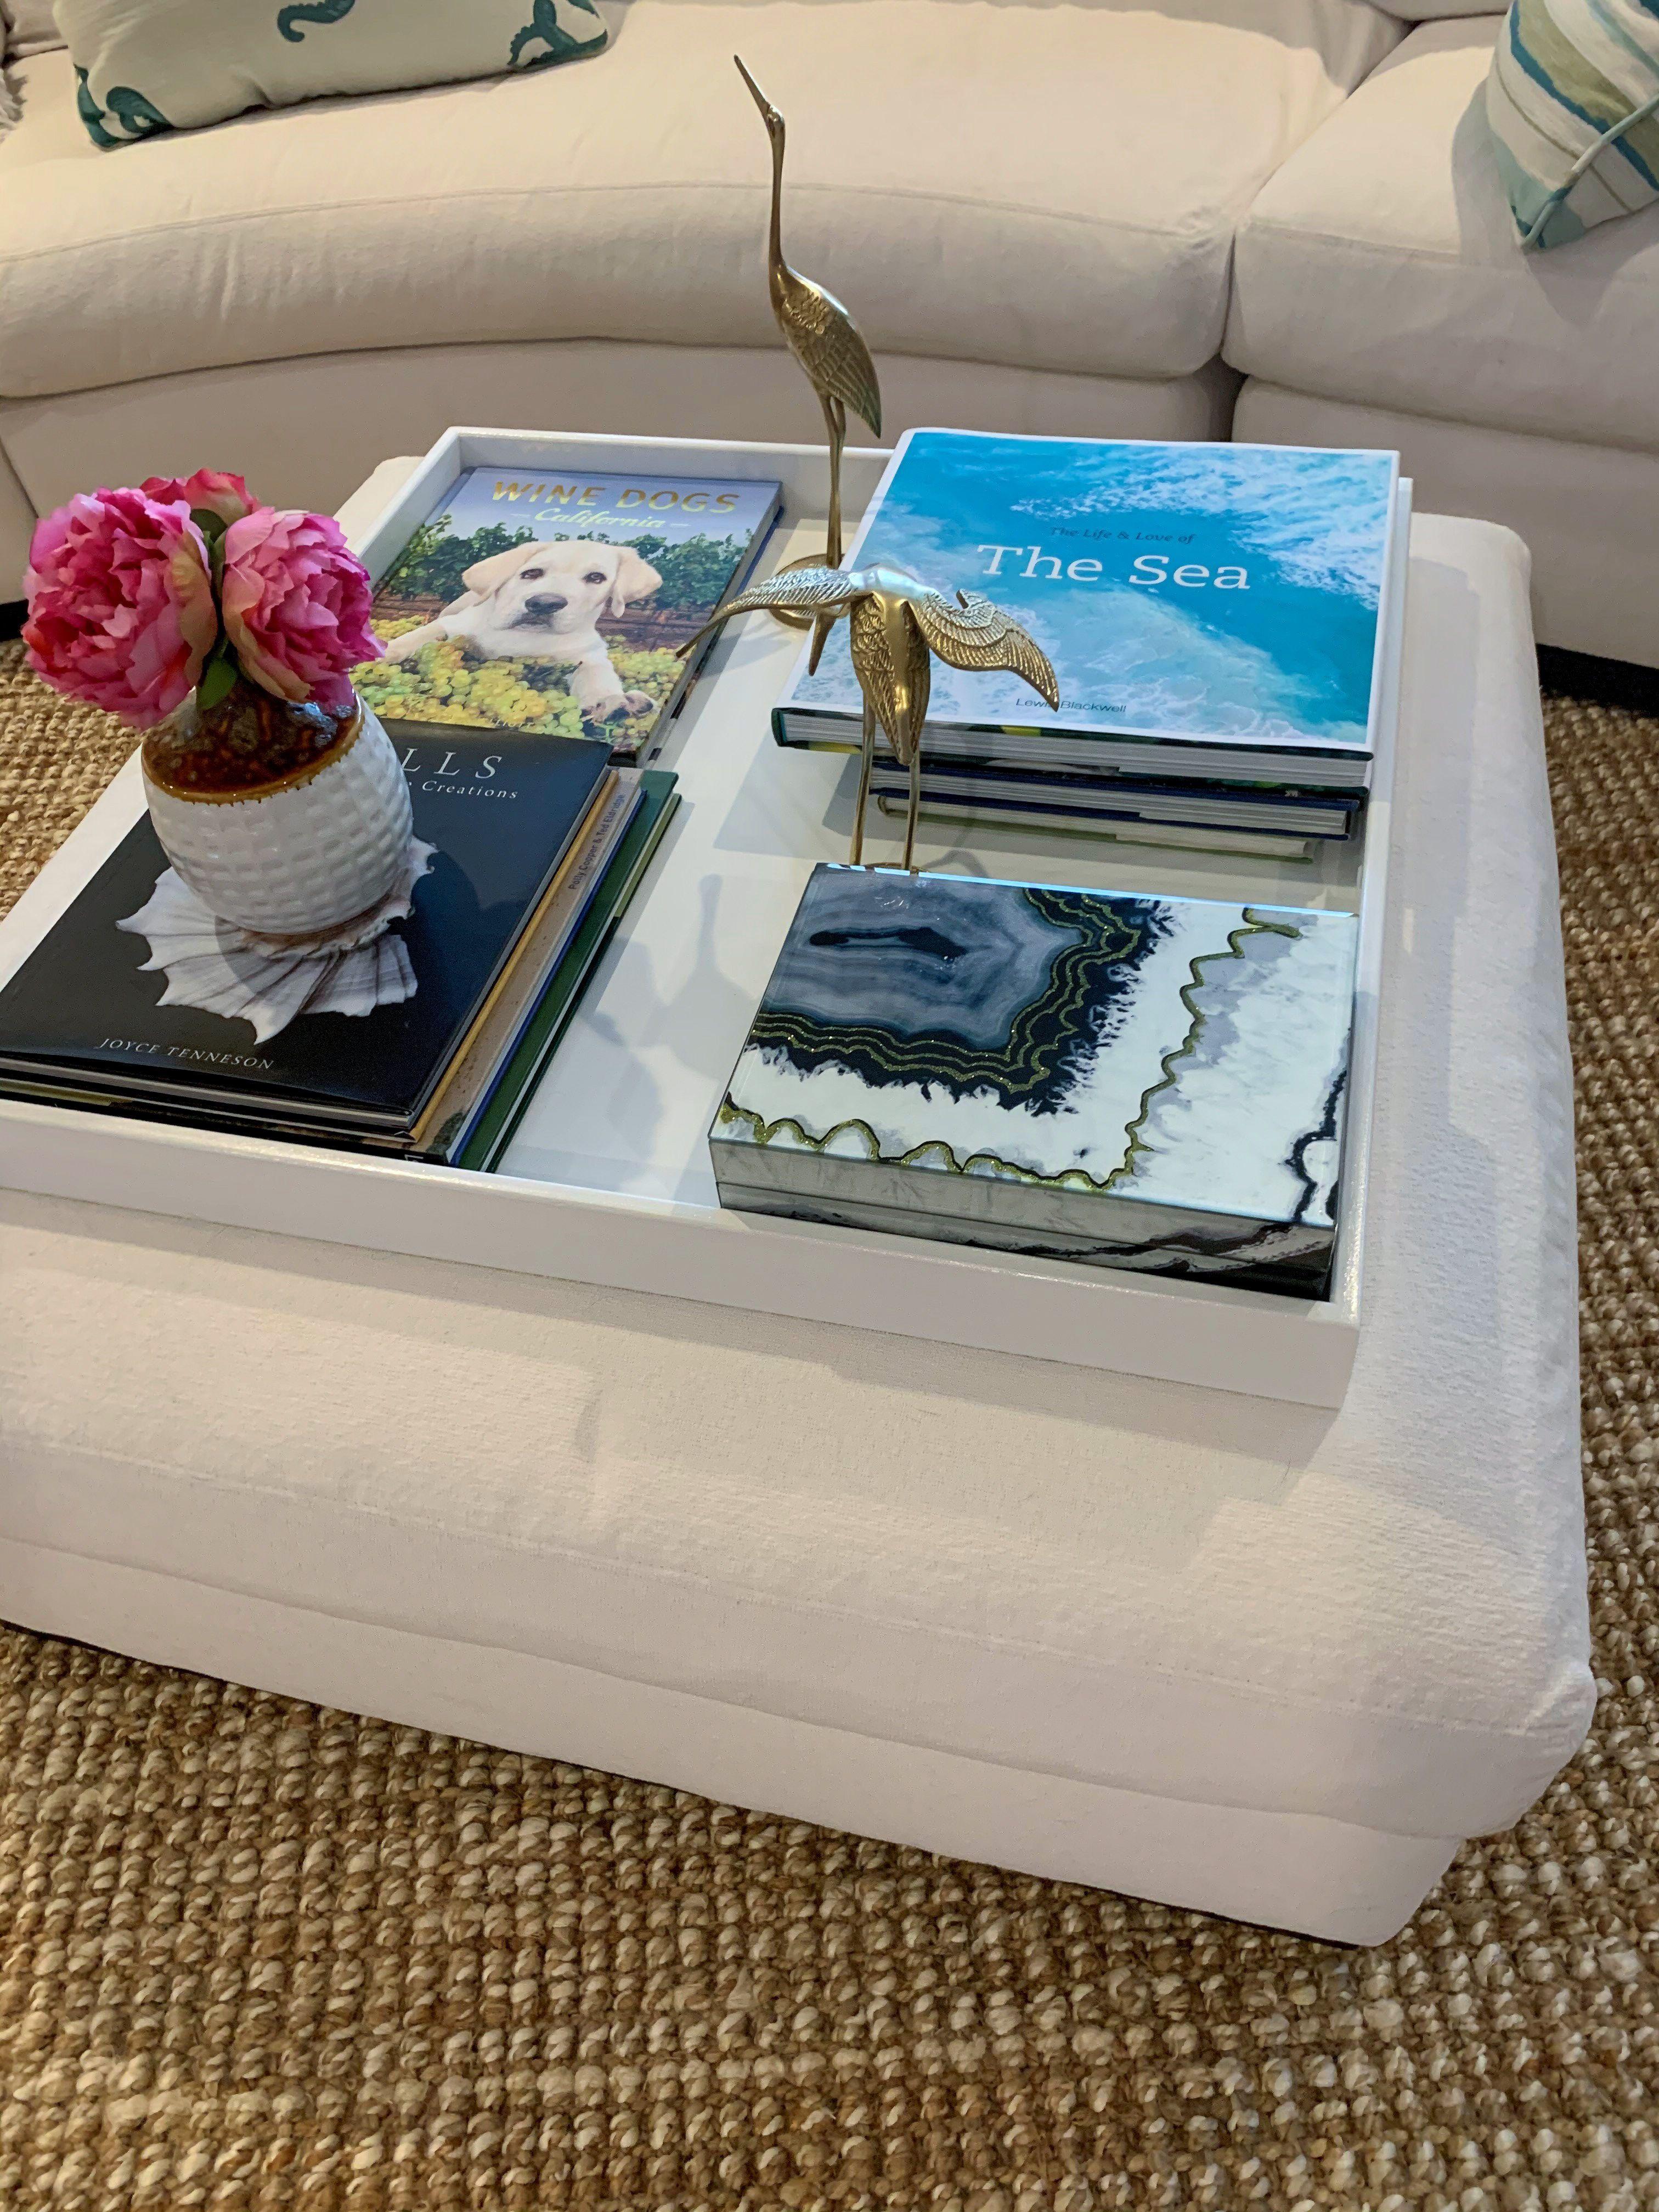 White Love It Up Decor Large Ottoman Tray Turquoise Home Decor Ottoman Tray [ 4032 x 3024 Pixel ]